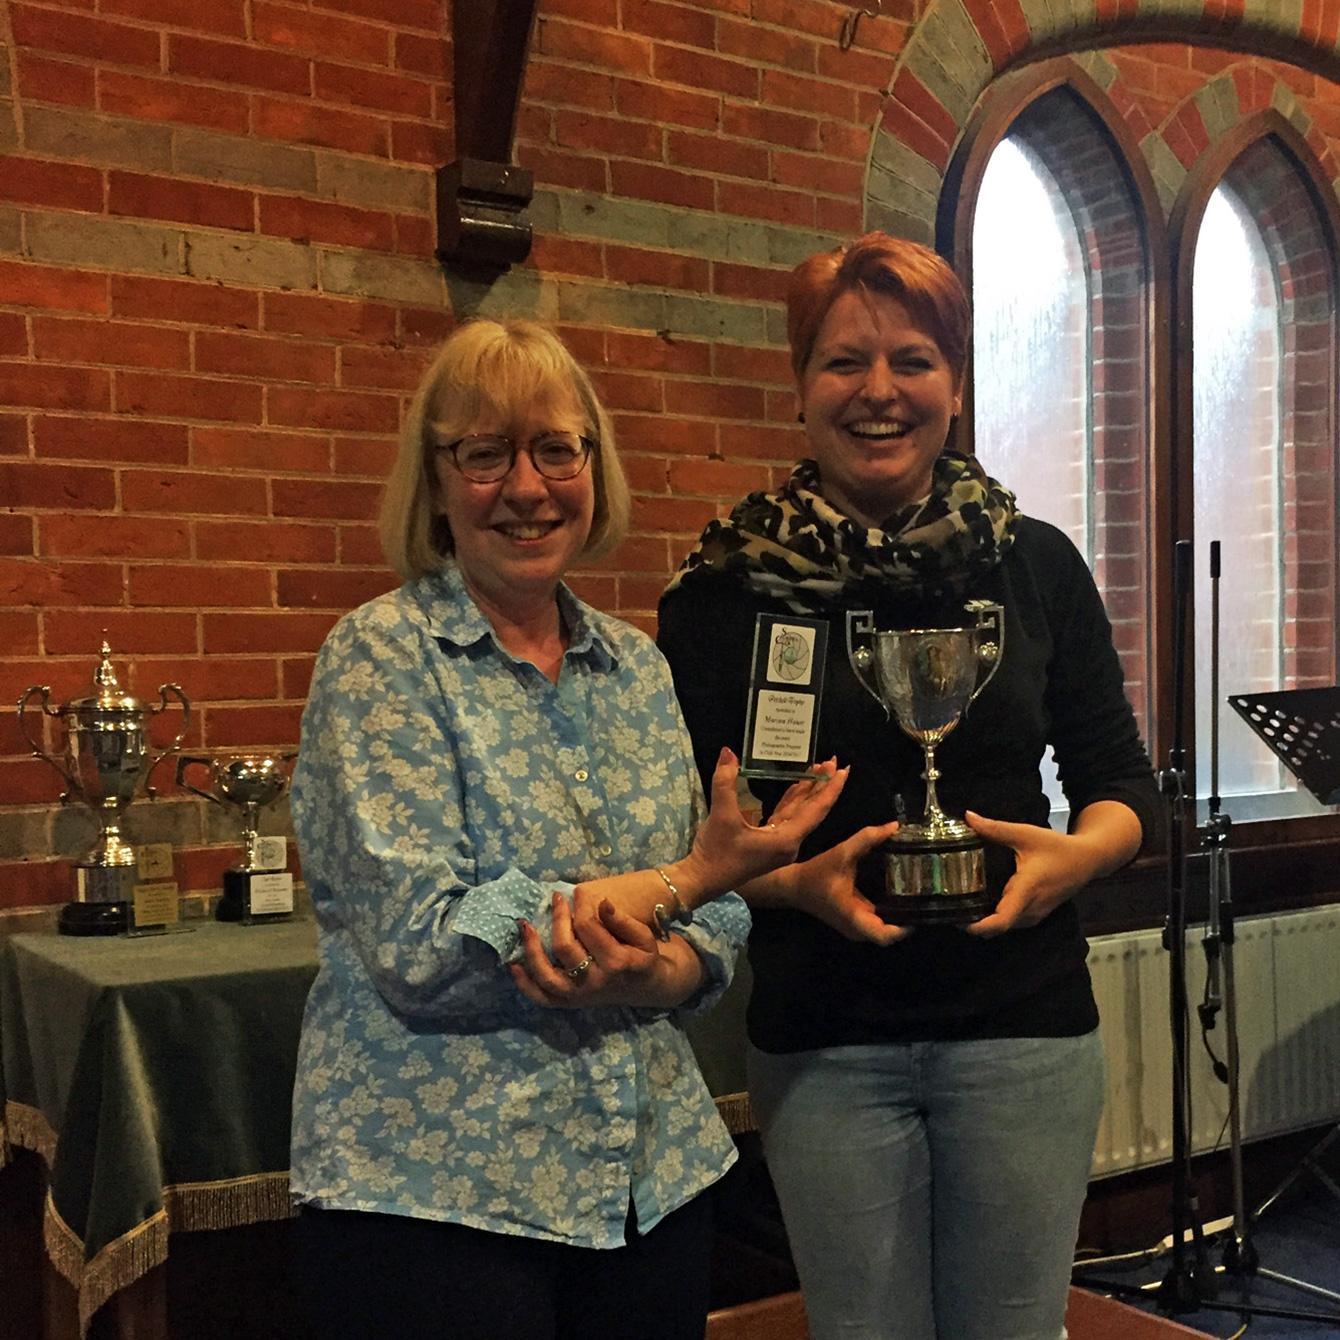 Petchell Trophy Winner Marina Hauer